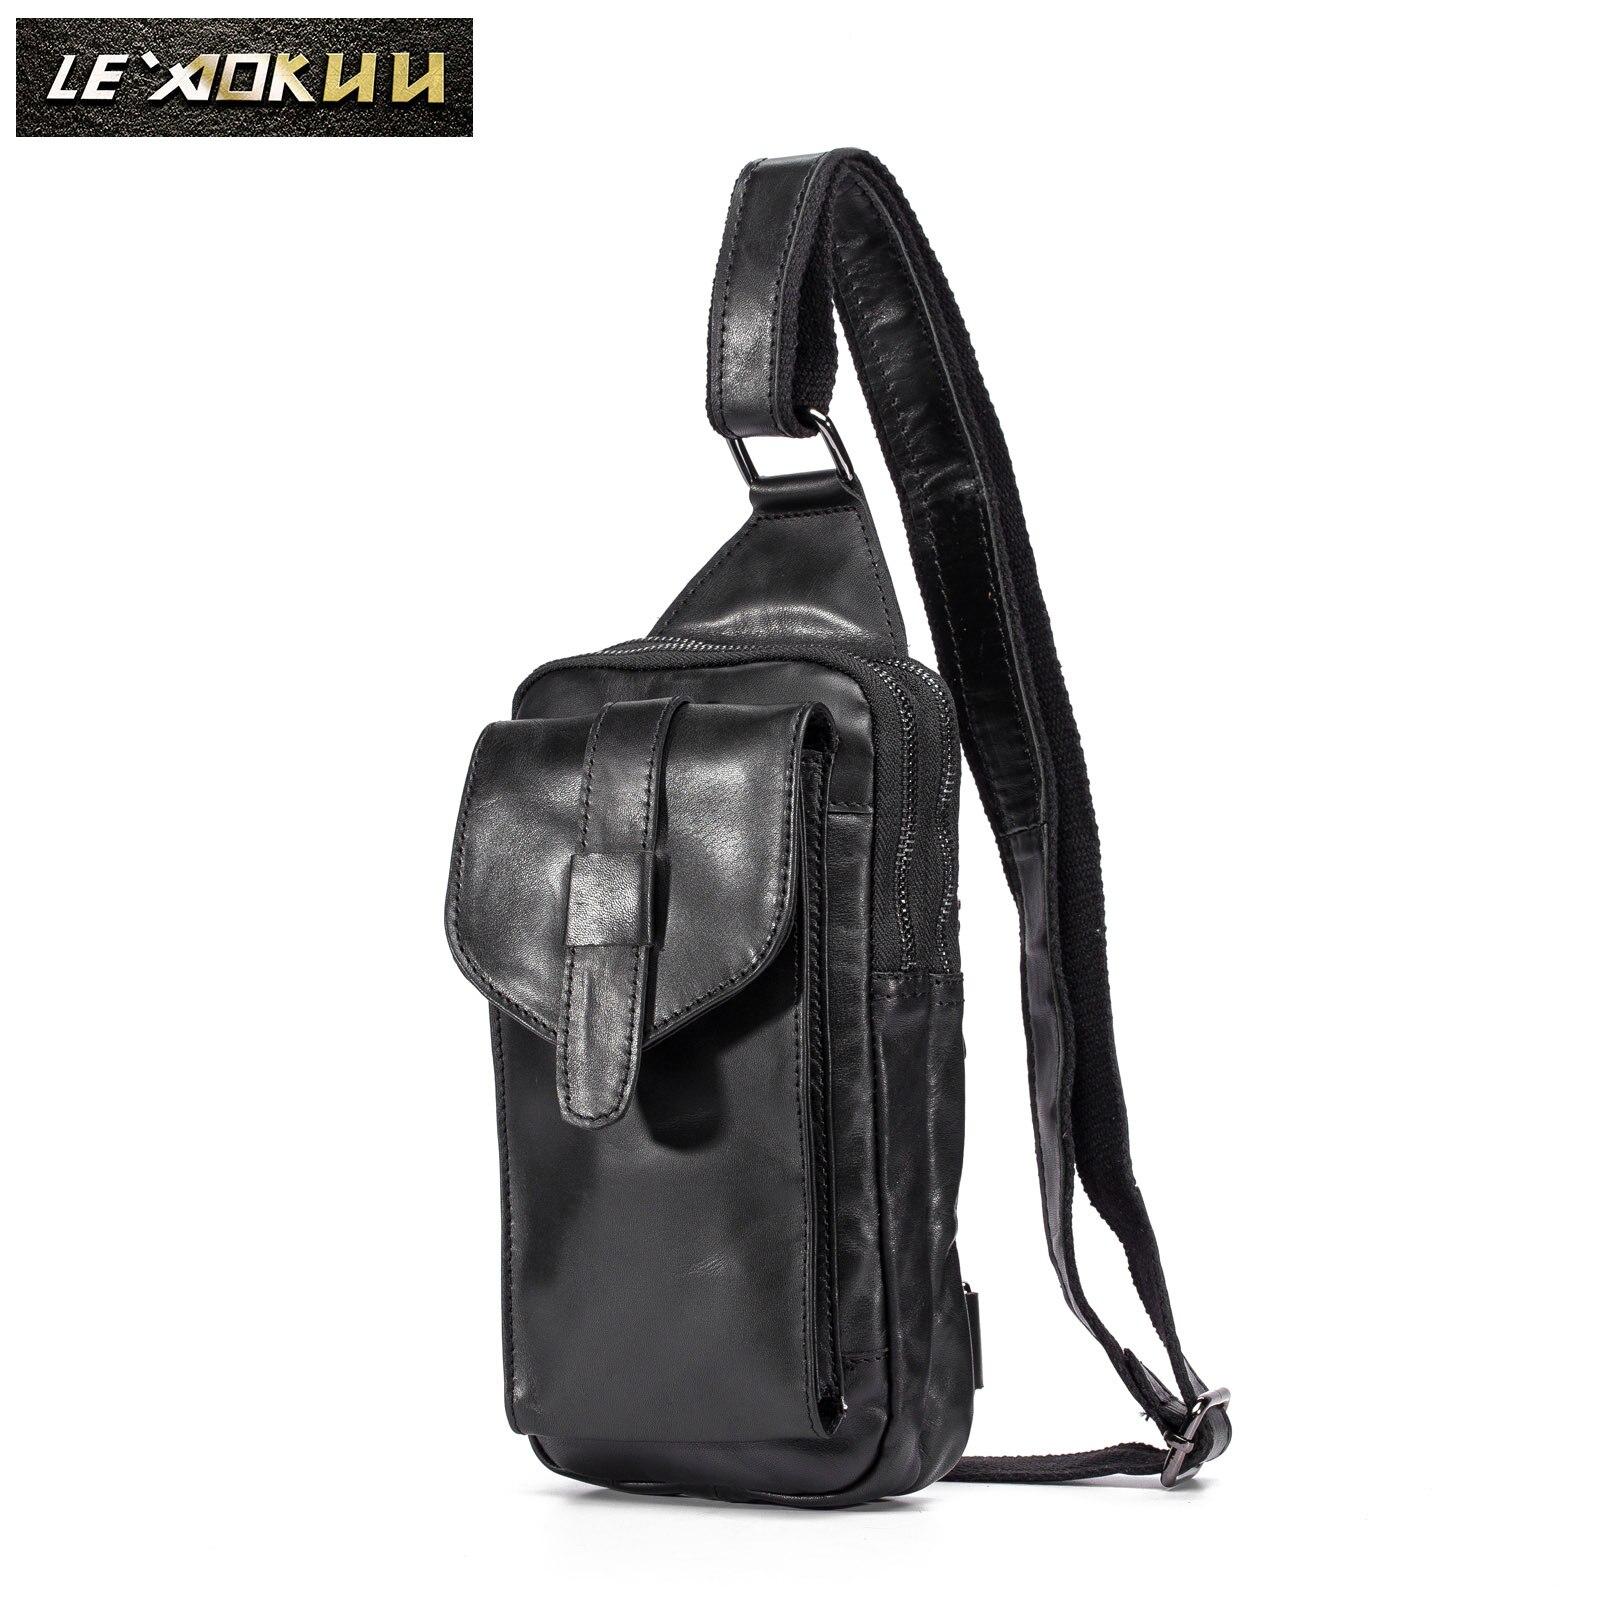 Top Quality Mens Genuine Real Leather Travel Backpack Belt Waist Chest Pack Bag Sling Crossbody Bag Daypack XB571-b